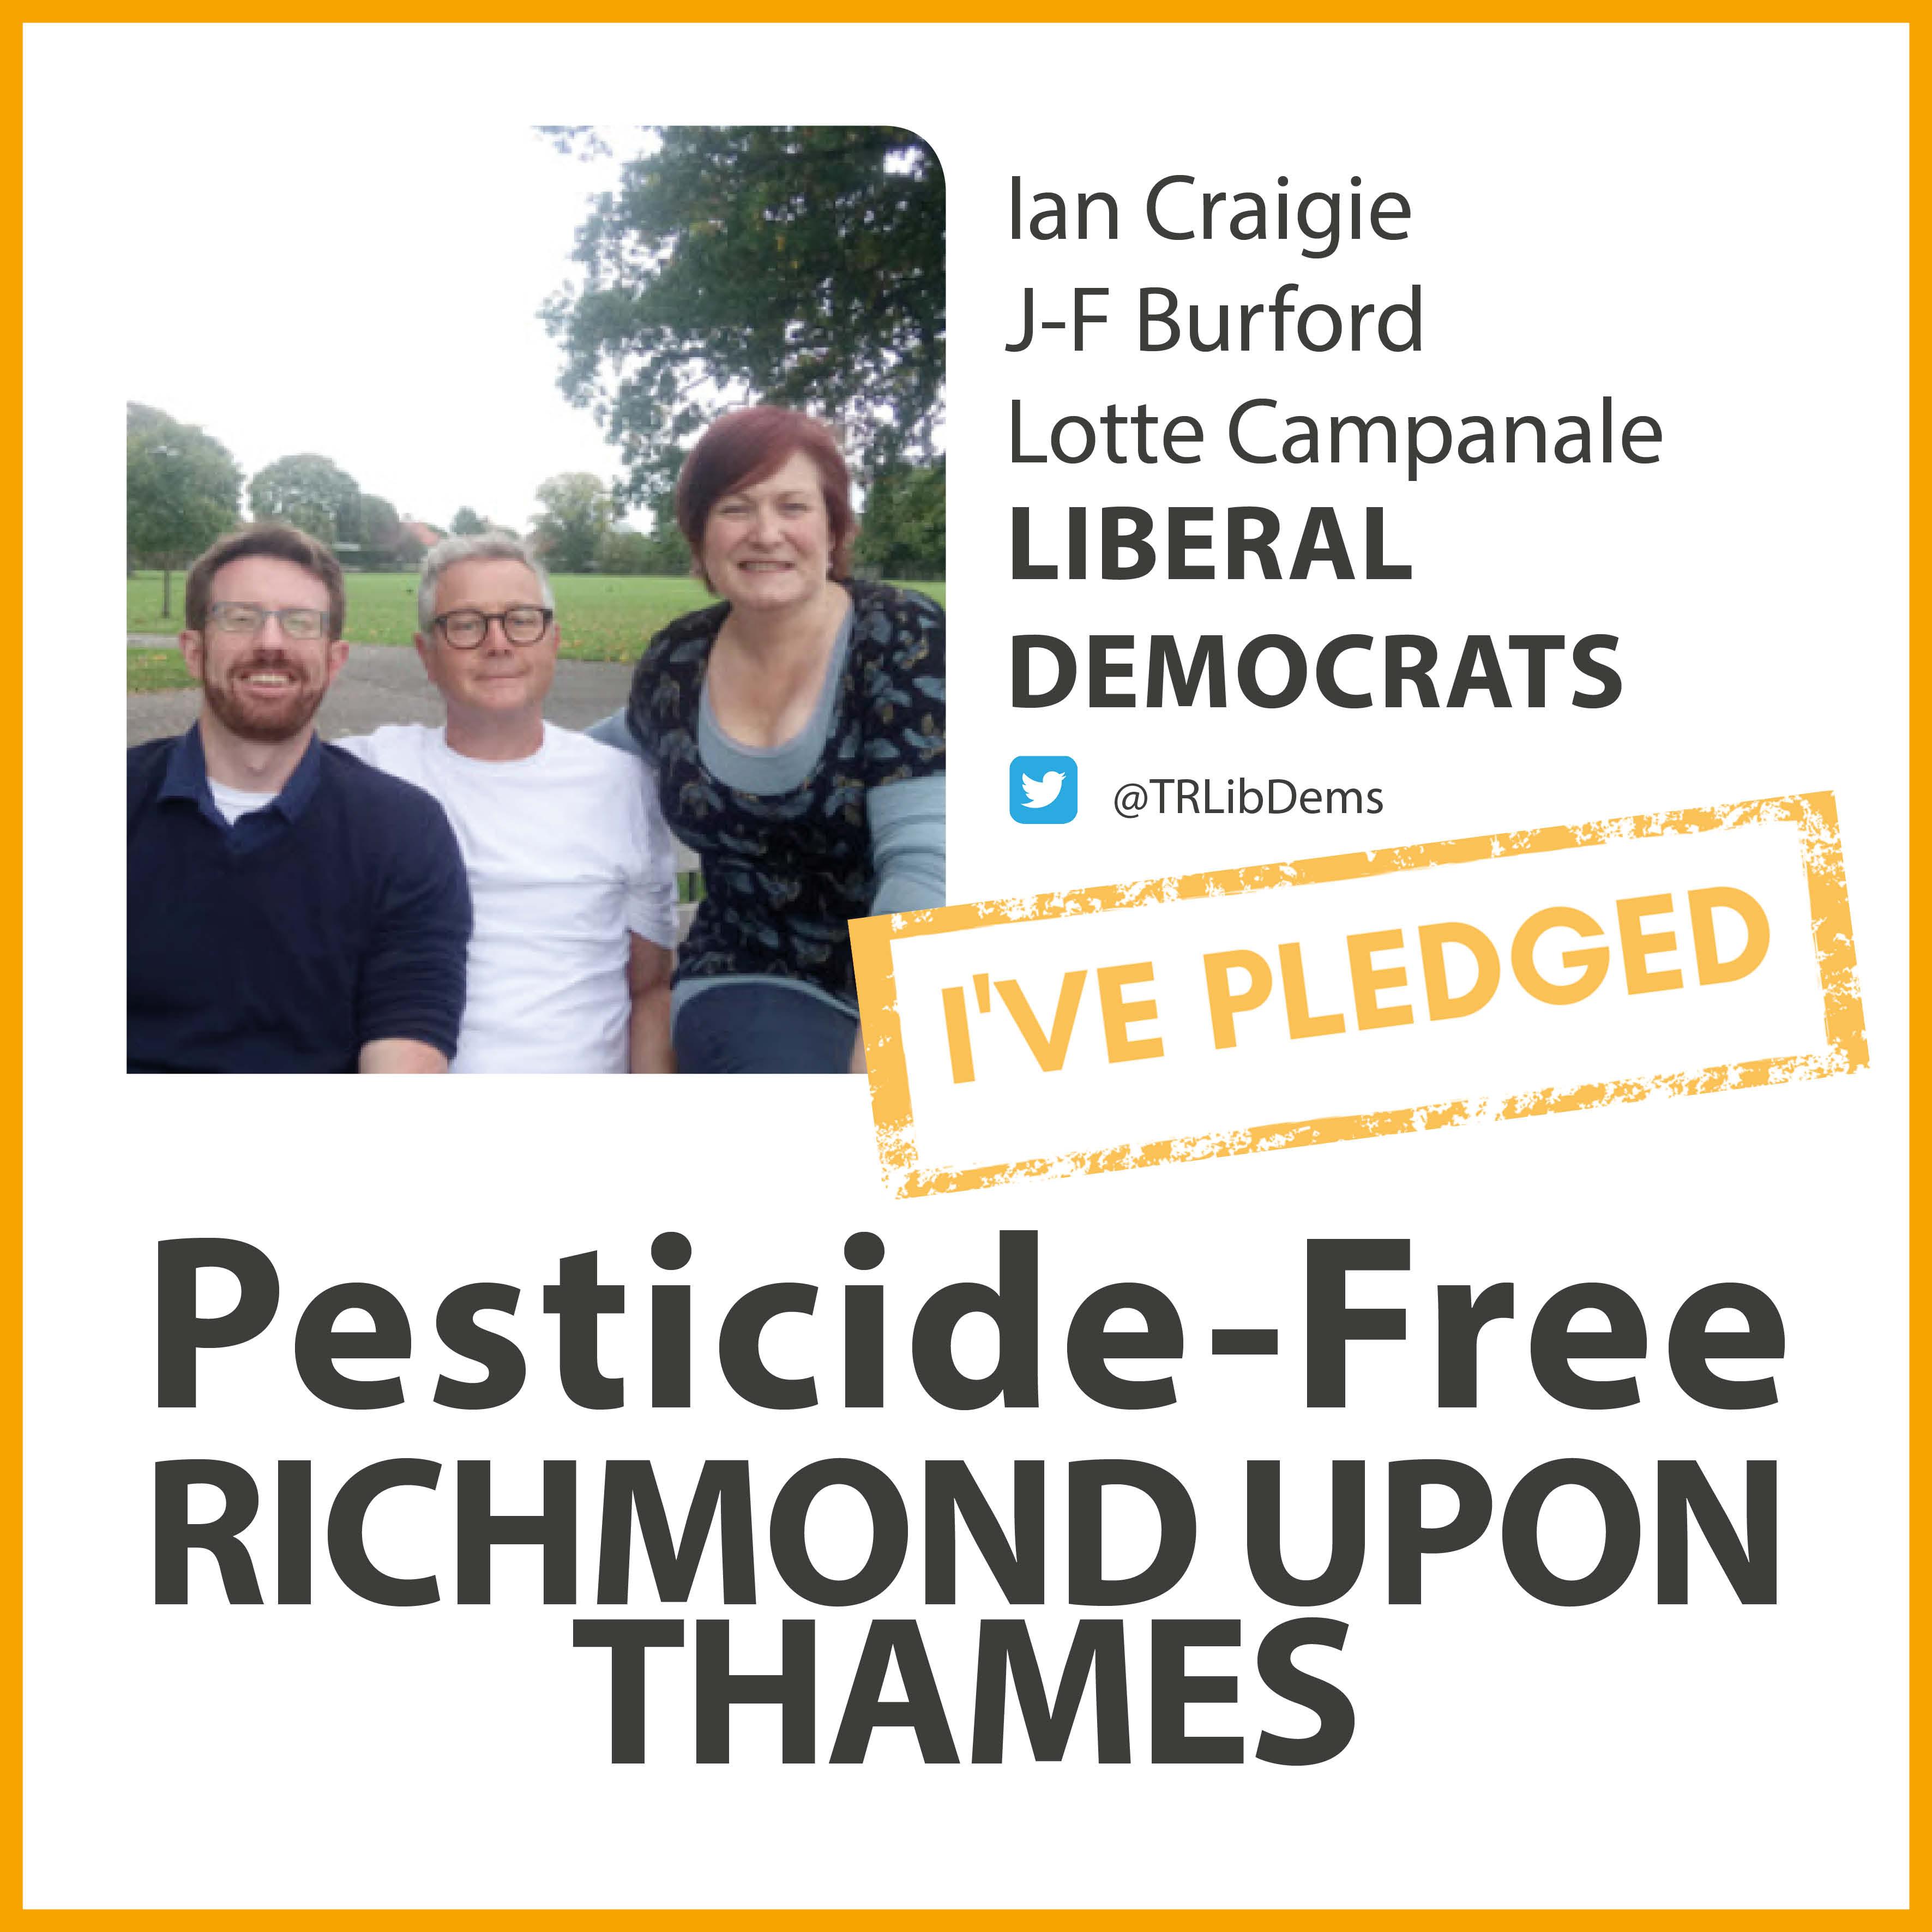 Kew Lib Dems have taken the pesticide-free pledge